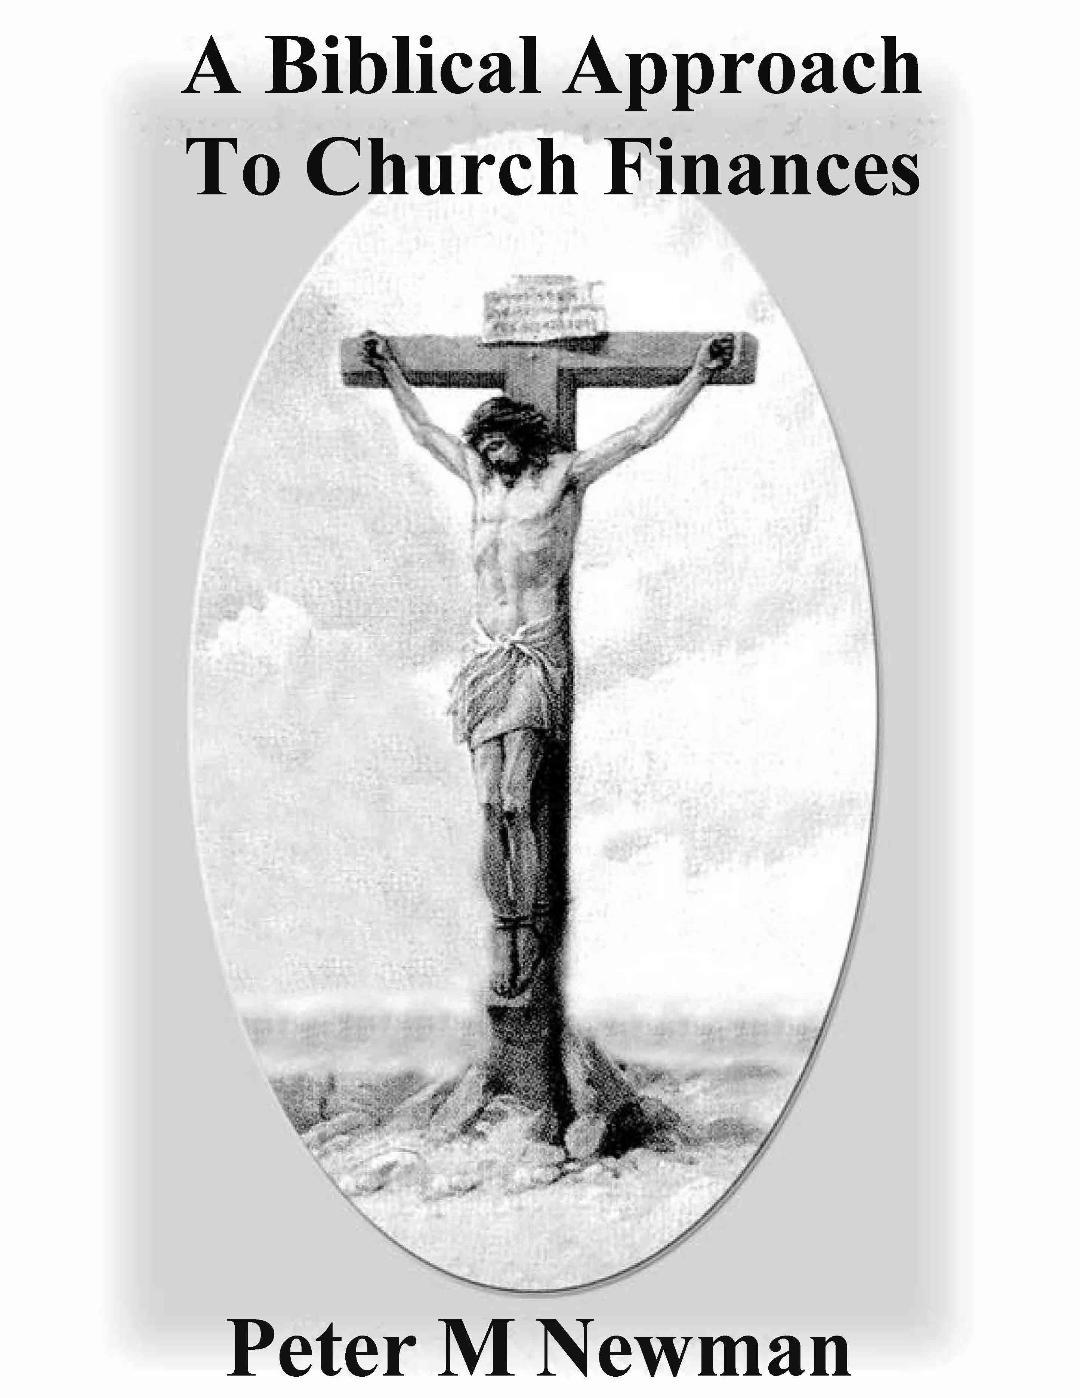 A Biblical Approach To Church Finances